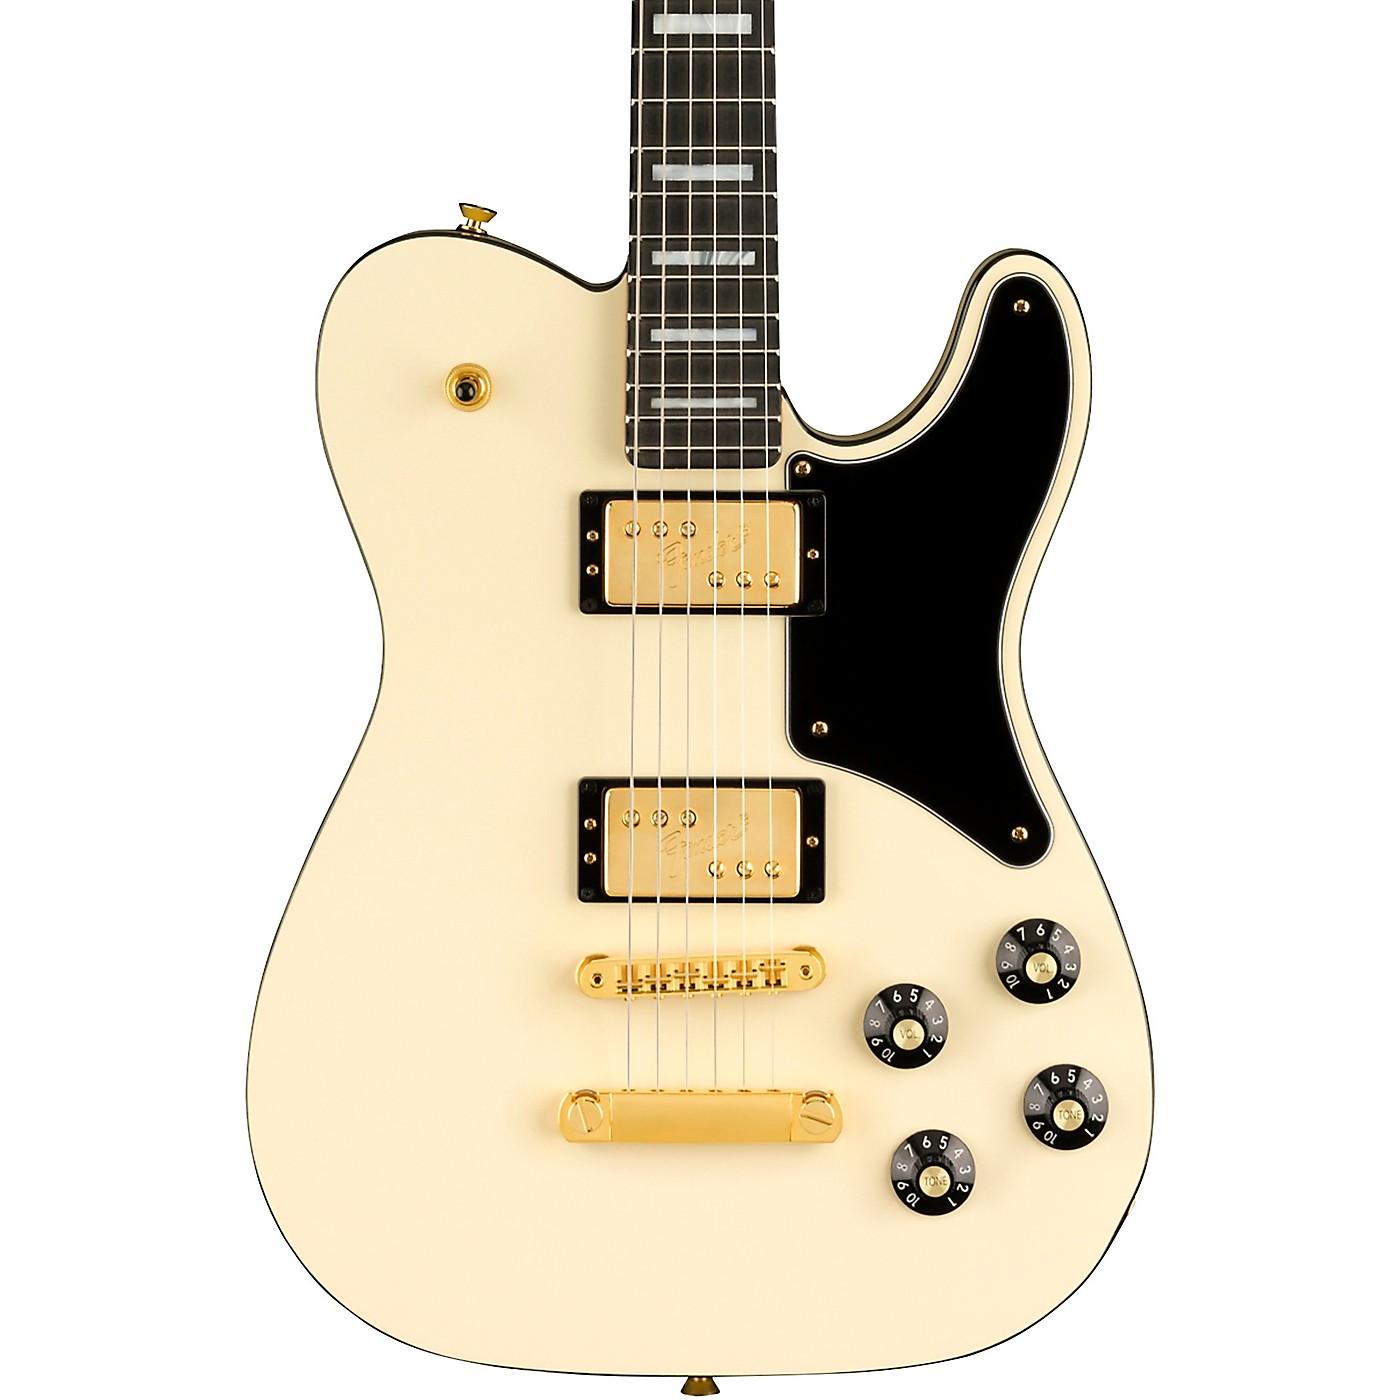 Fender Parallel Universe Vol. II Troublemaker Tele Deluxe Electric Guitar thumbnail